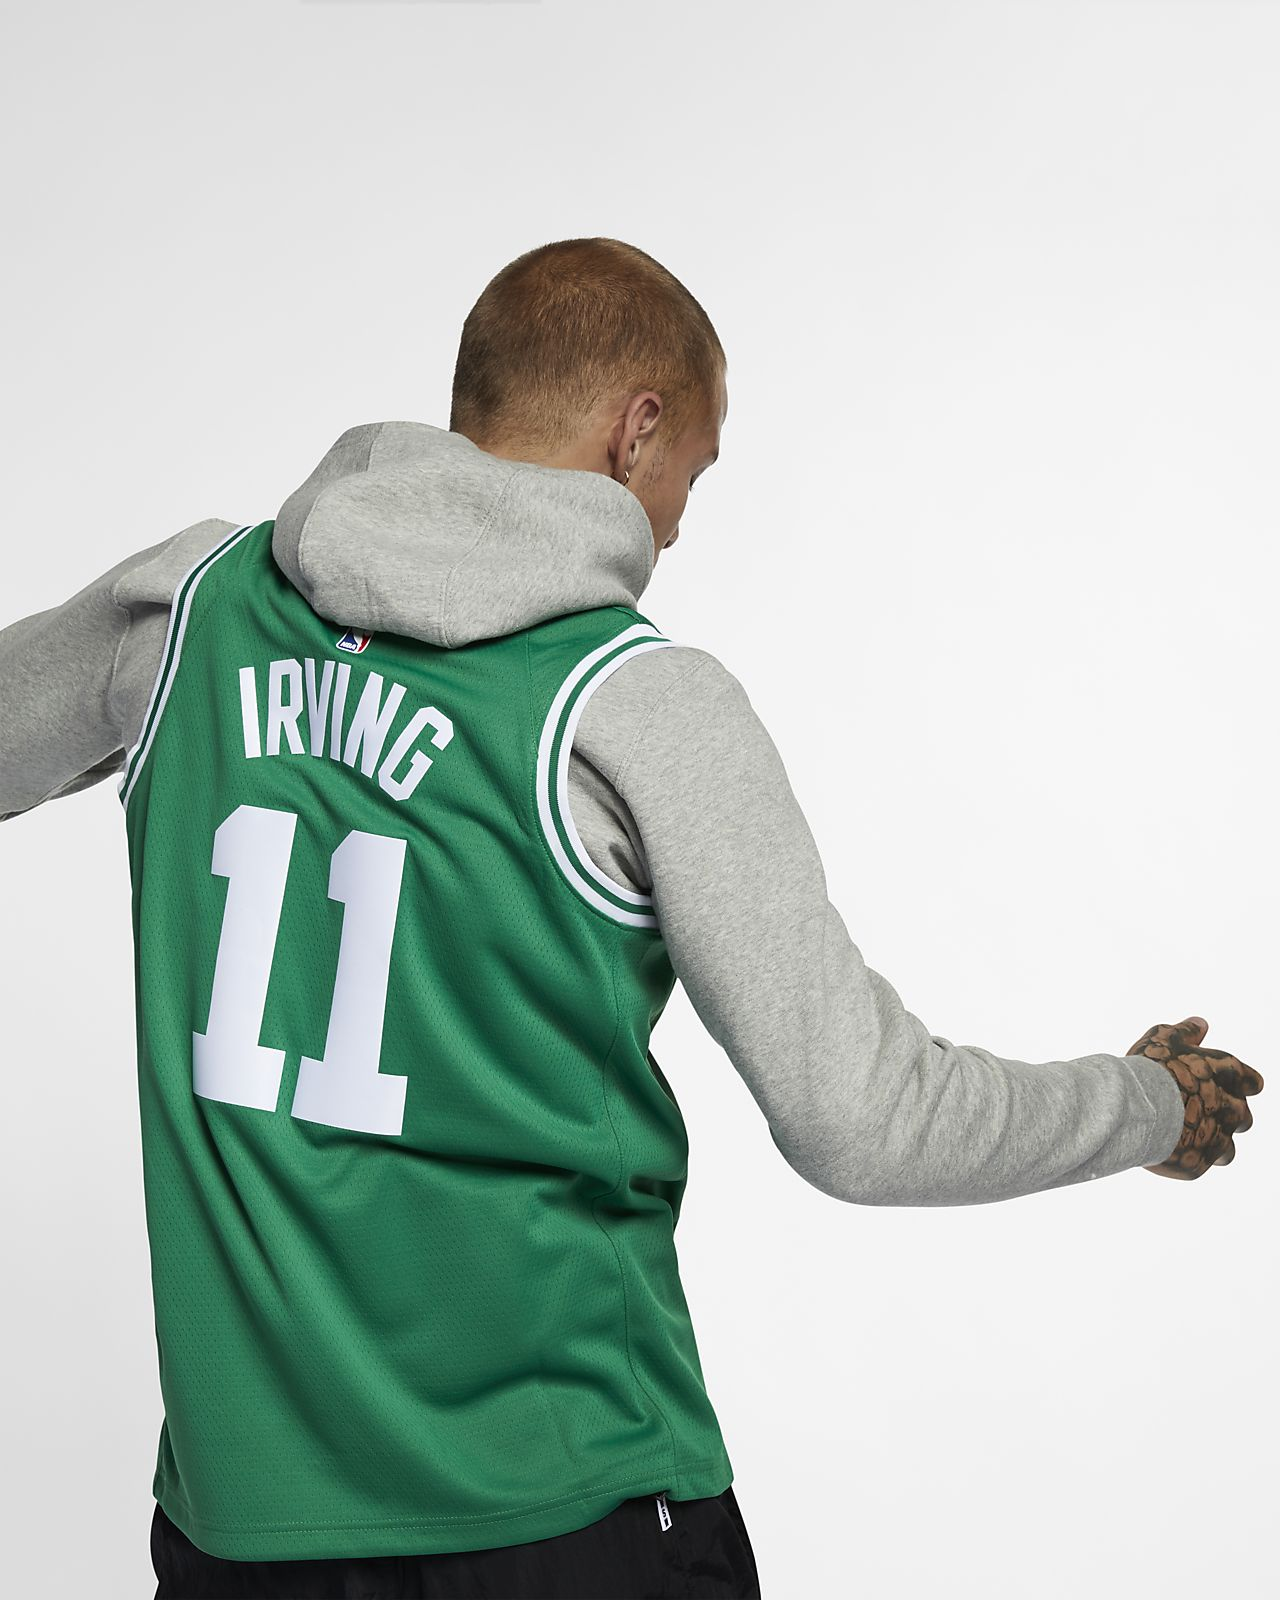 bfb1d6e584a ... Kyrie Irving Icon Edition Swingman (Boston Celtics) Men s Nike NBA  Connected Jersey